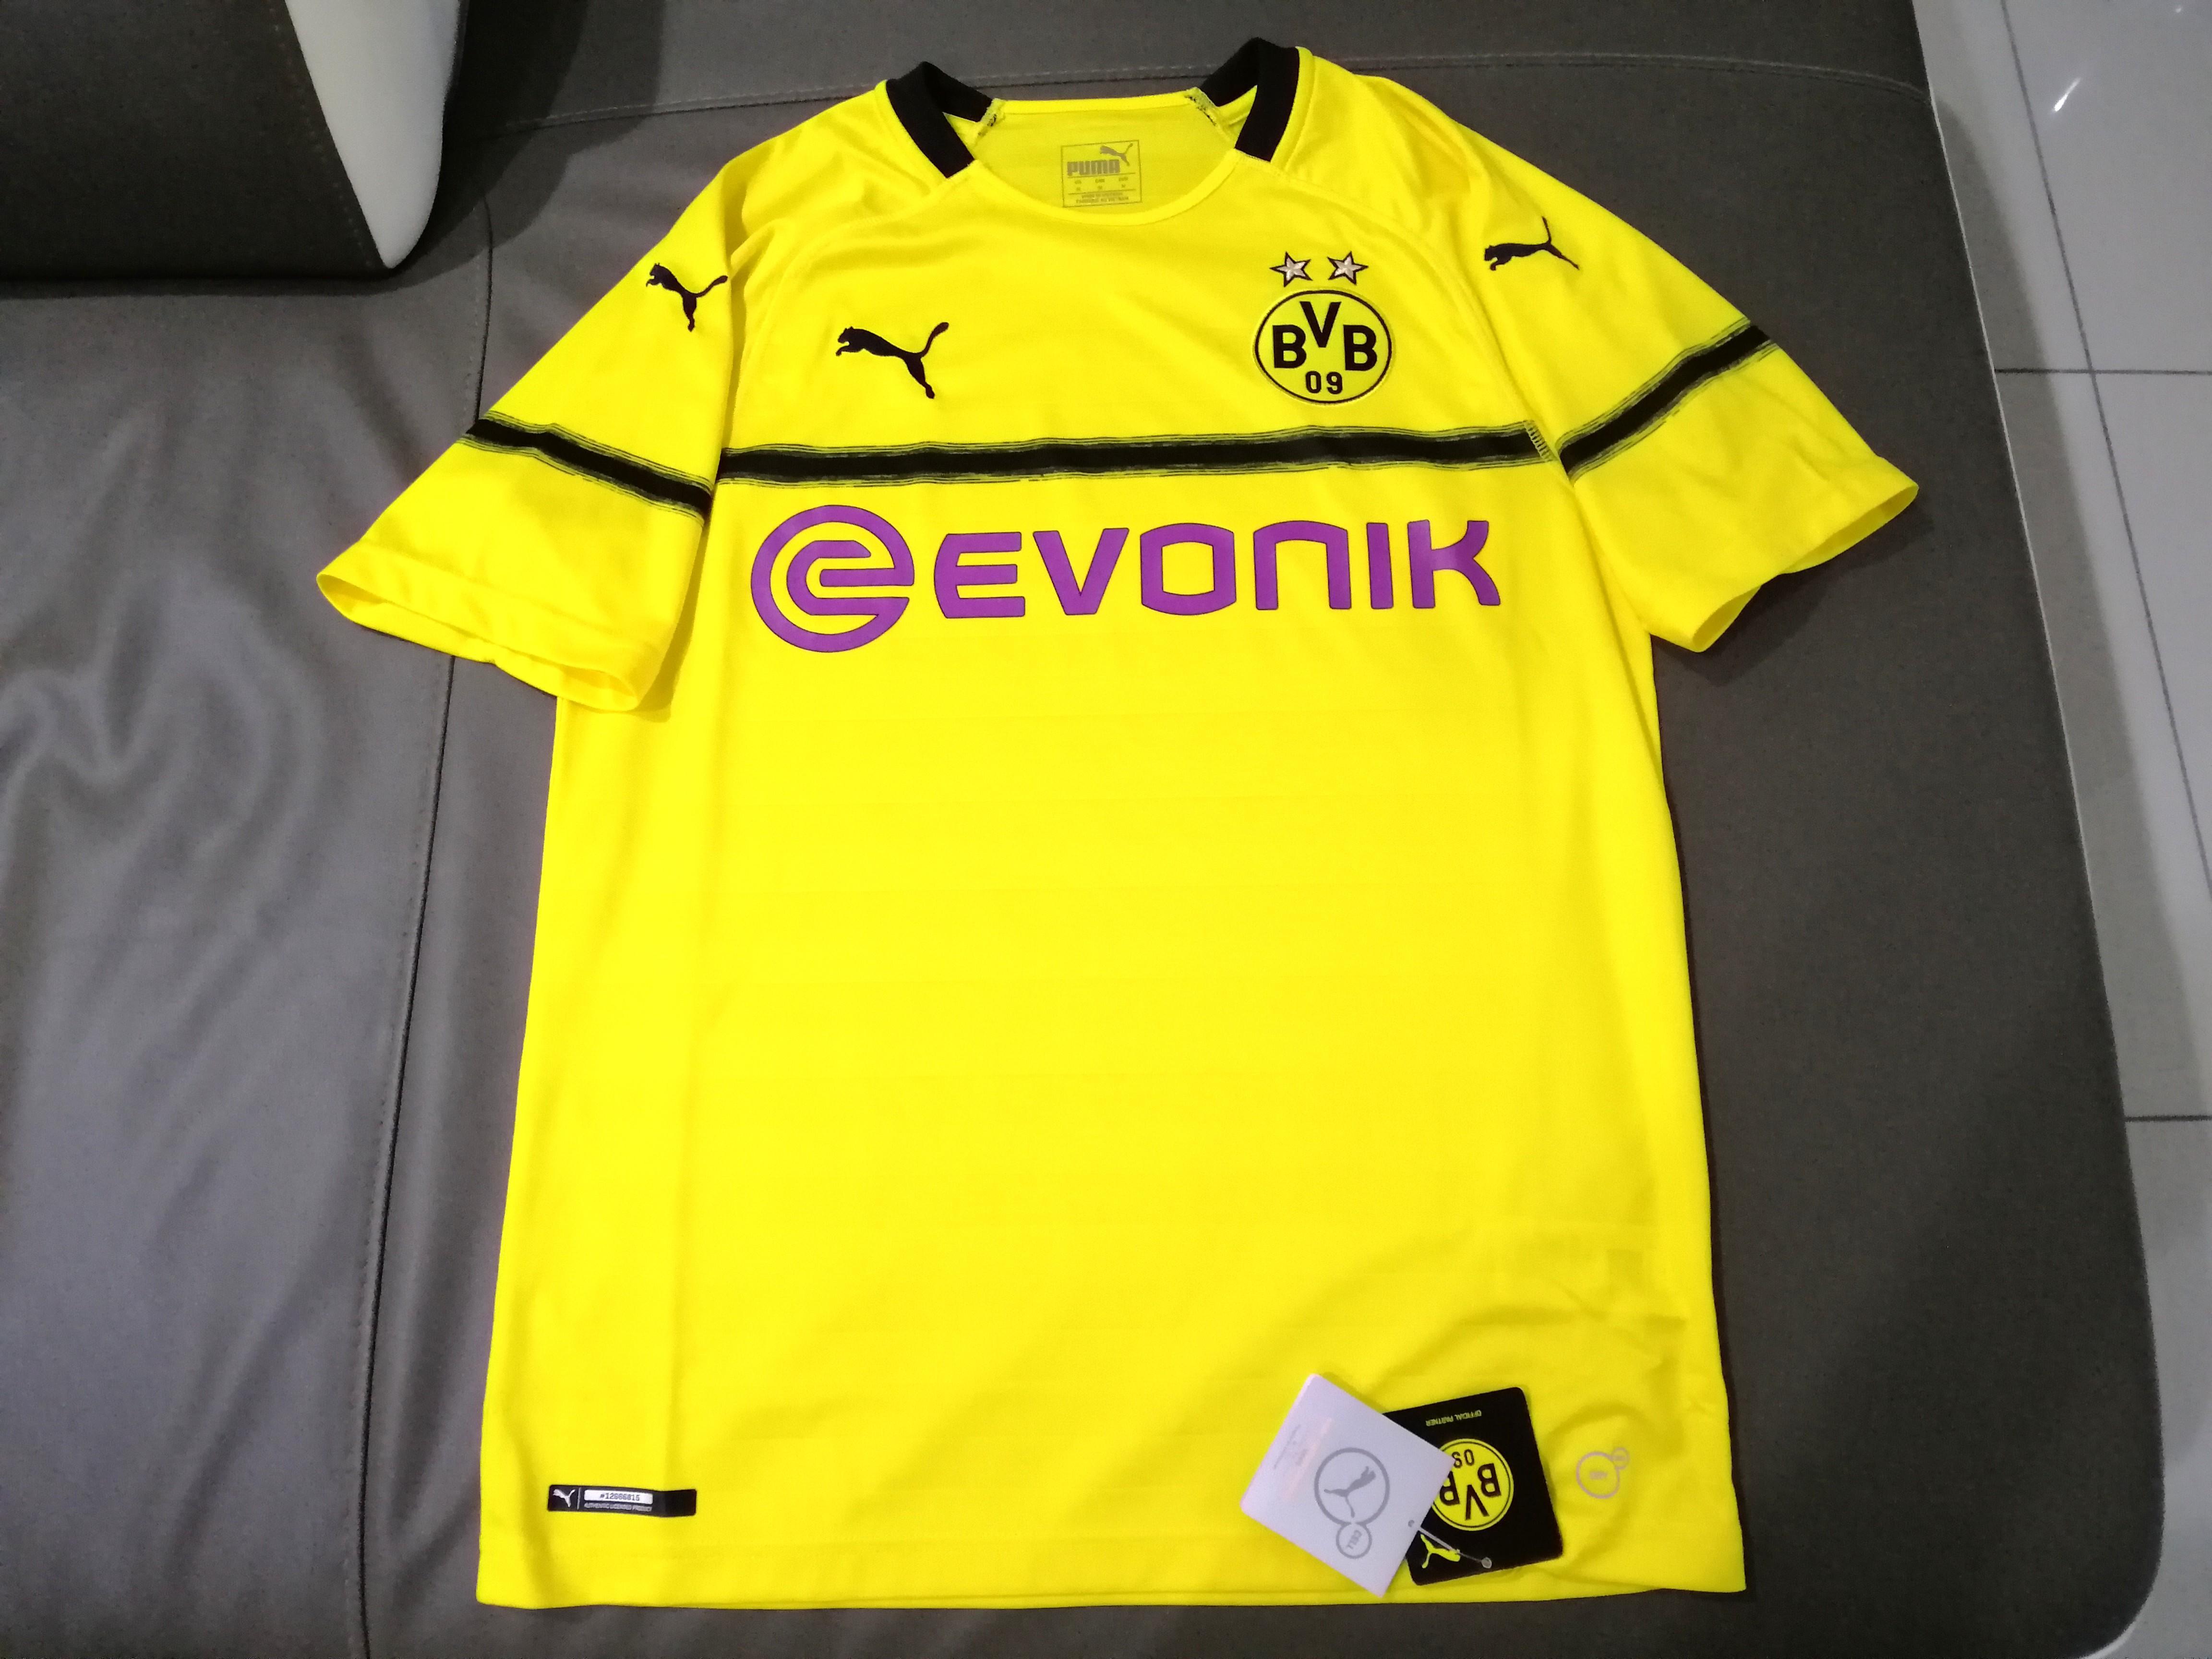 New Original Puma Borussia Dortmund Bvb 3rd Cup Jersey 18 19 Sports Athletic Sports Clothing On Carousell